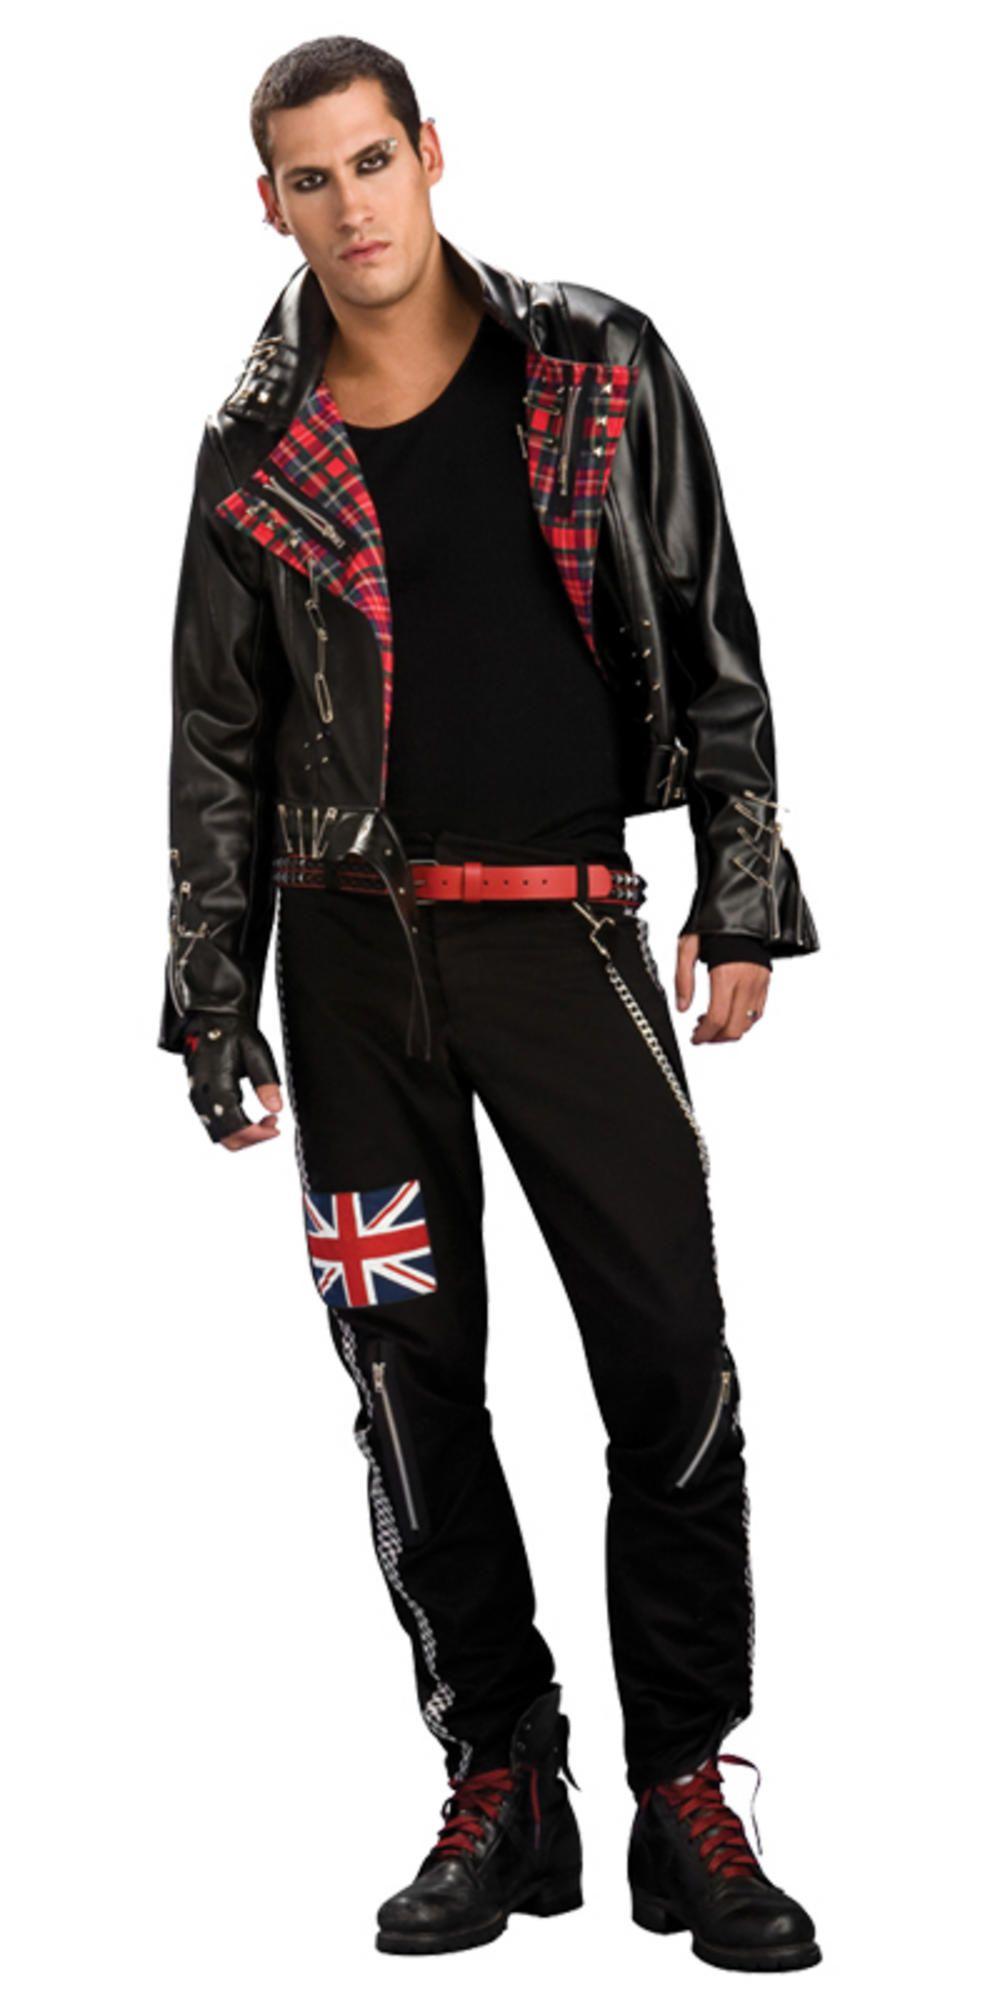 punk rocker costume ideas punk rock halloween costume ideas - Halloween Punk Costume